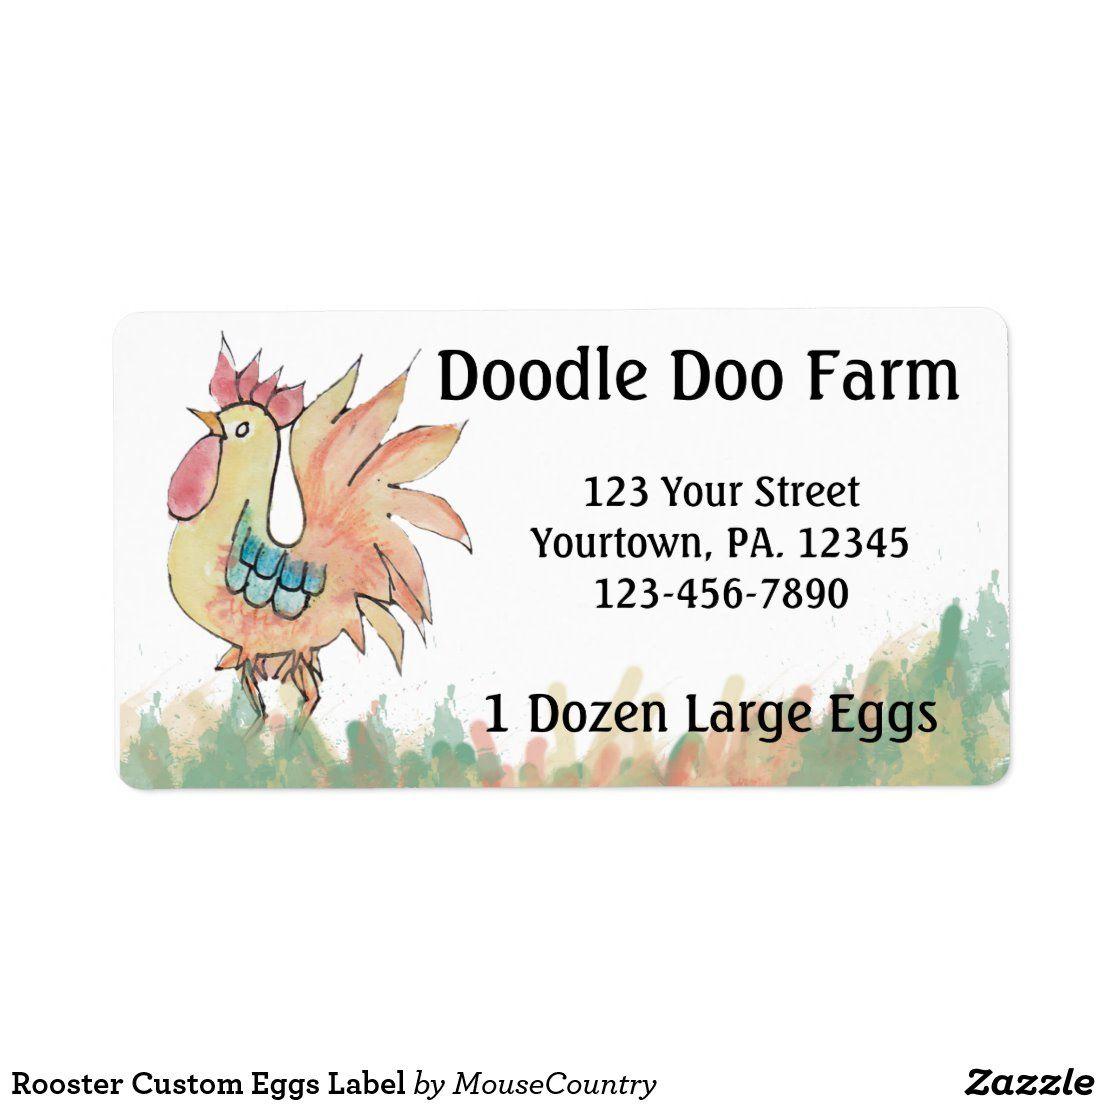 Rooster Custom Eggs Label